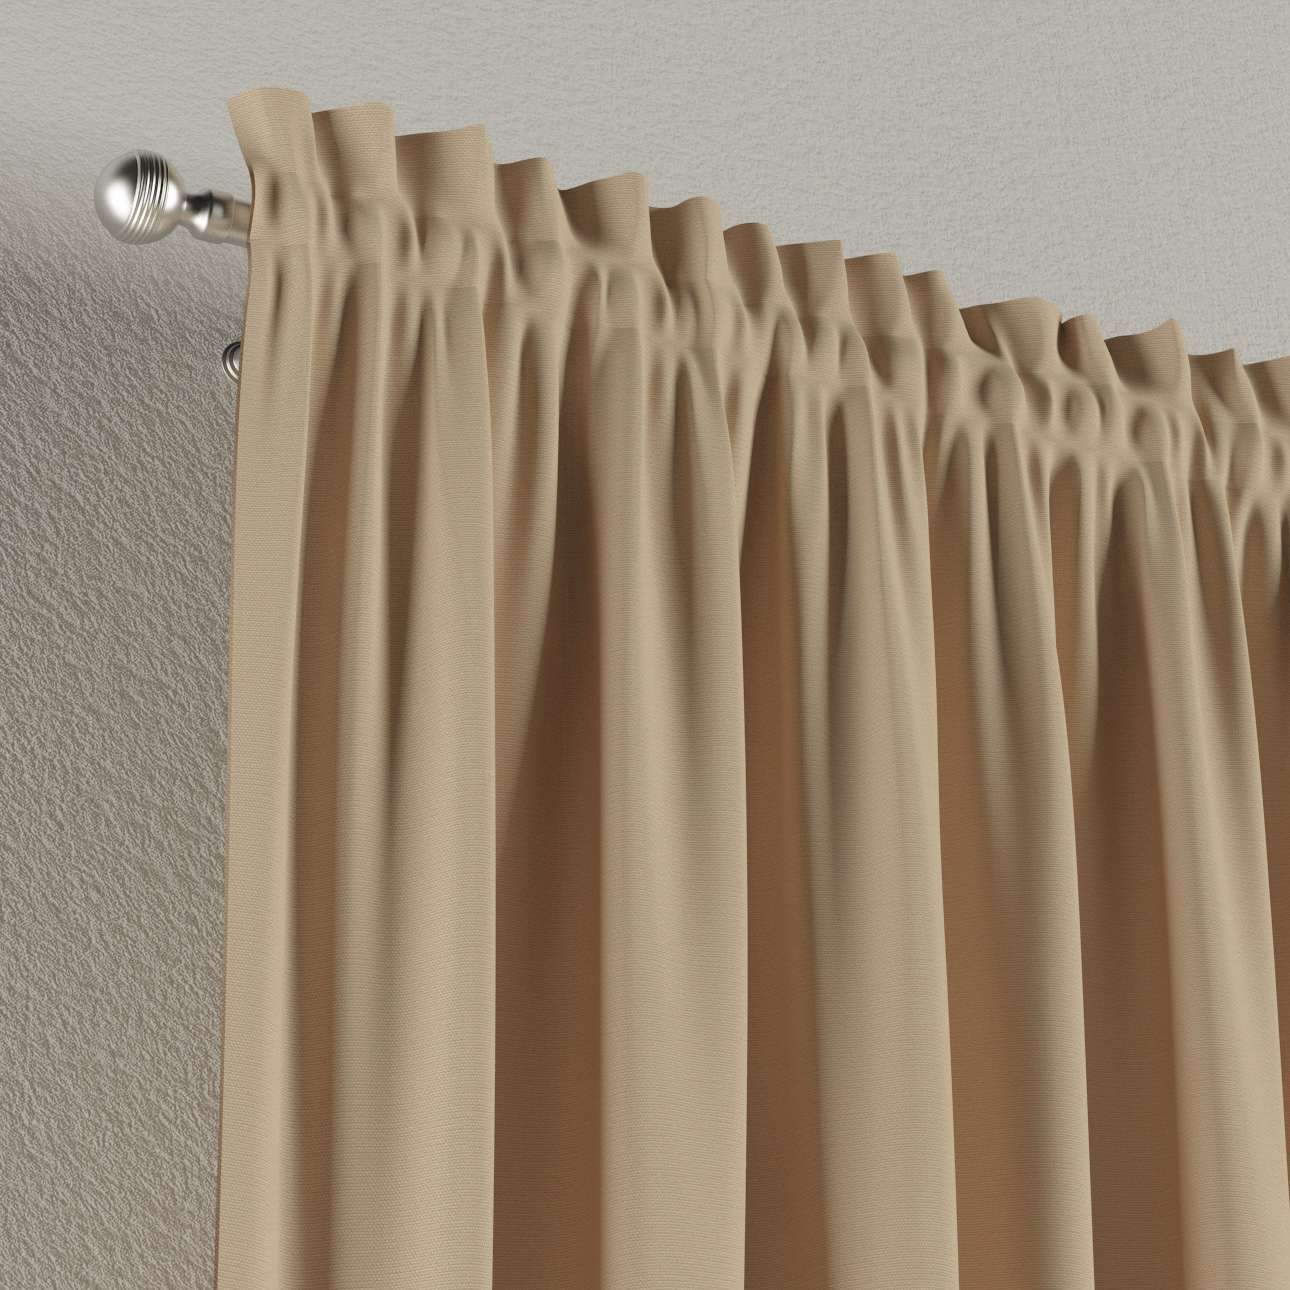 Gardin med kanal - Multiband 1 längd i kollektionen Panama Cotton, Tyg: 702-01